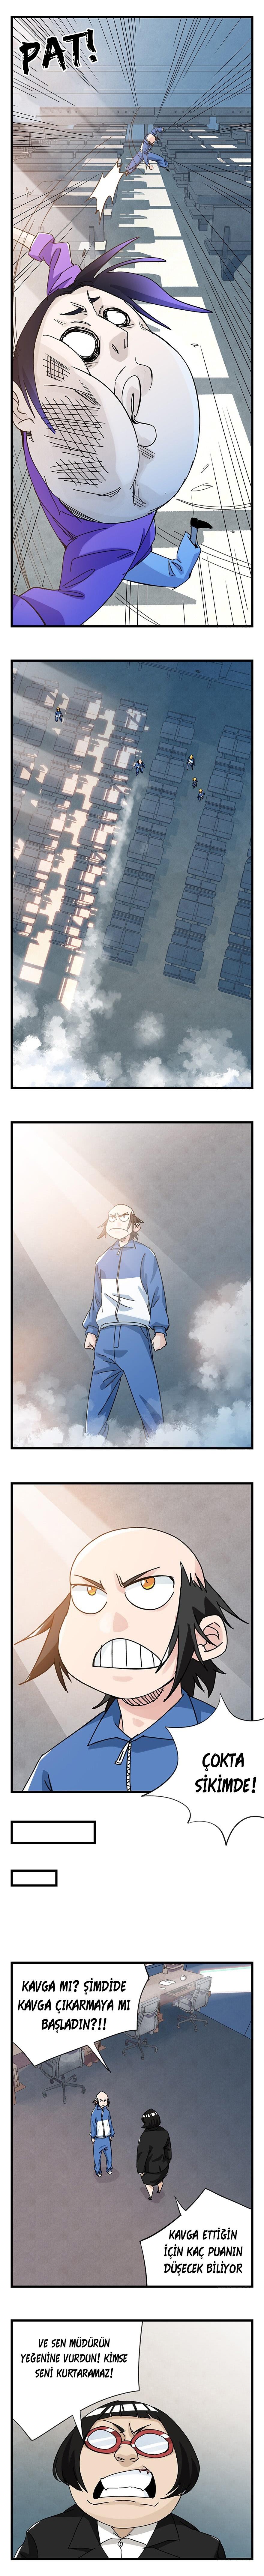 tower-into-the-cloudsbolum-116